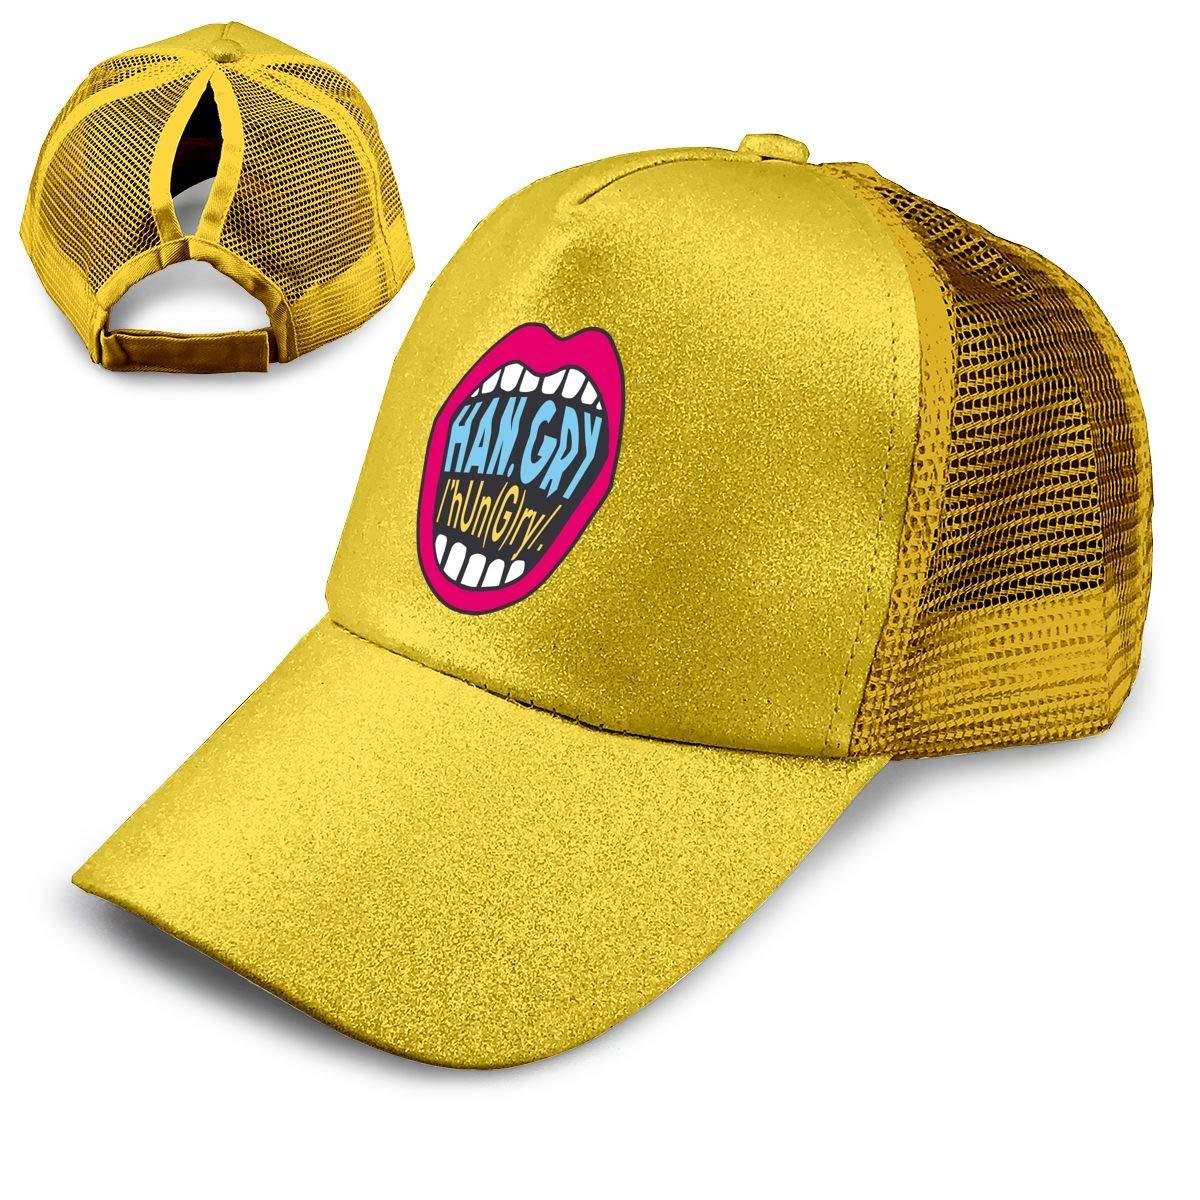 Summer Han.Gry Print Celebrity Ages Ponytail Messy High Bun Hat Ponycaps Baseball Cap Adjustable Trucker Cap Mesh Cap